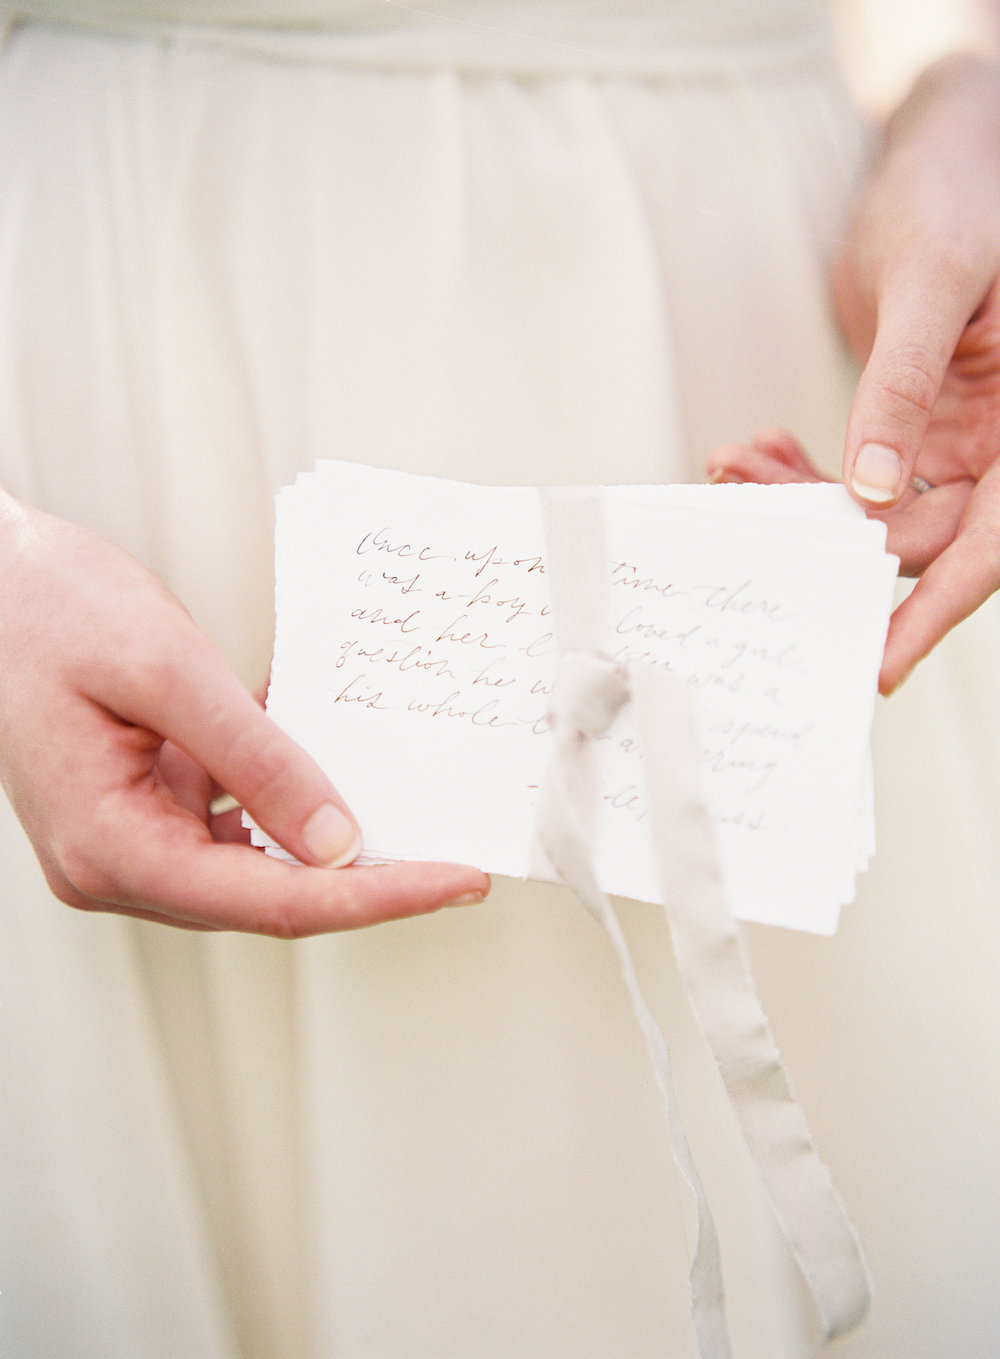 Calligraphy Wedding Vows - Romantic Wedding Ideas